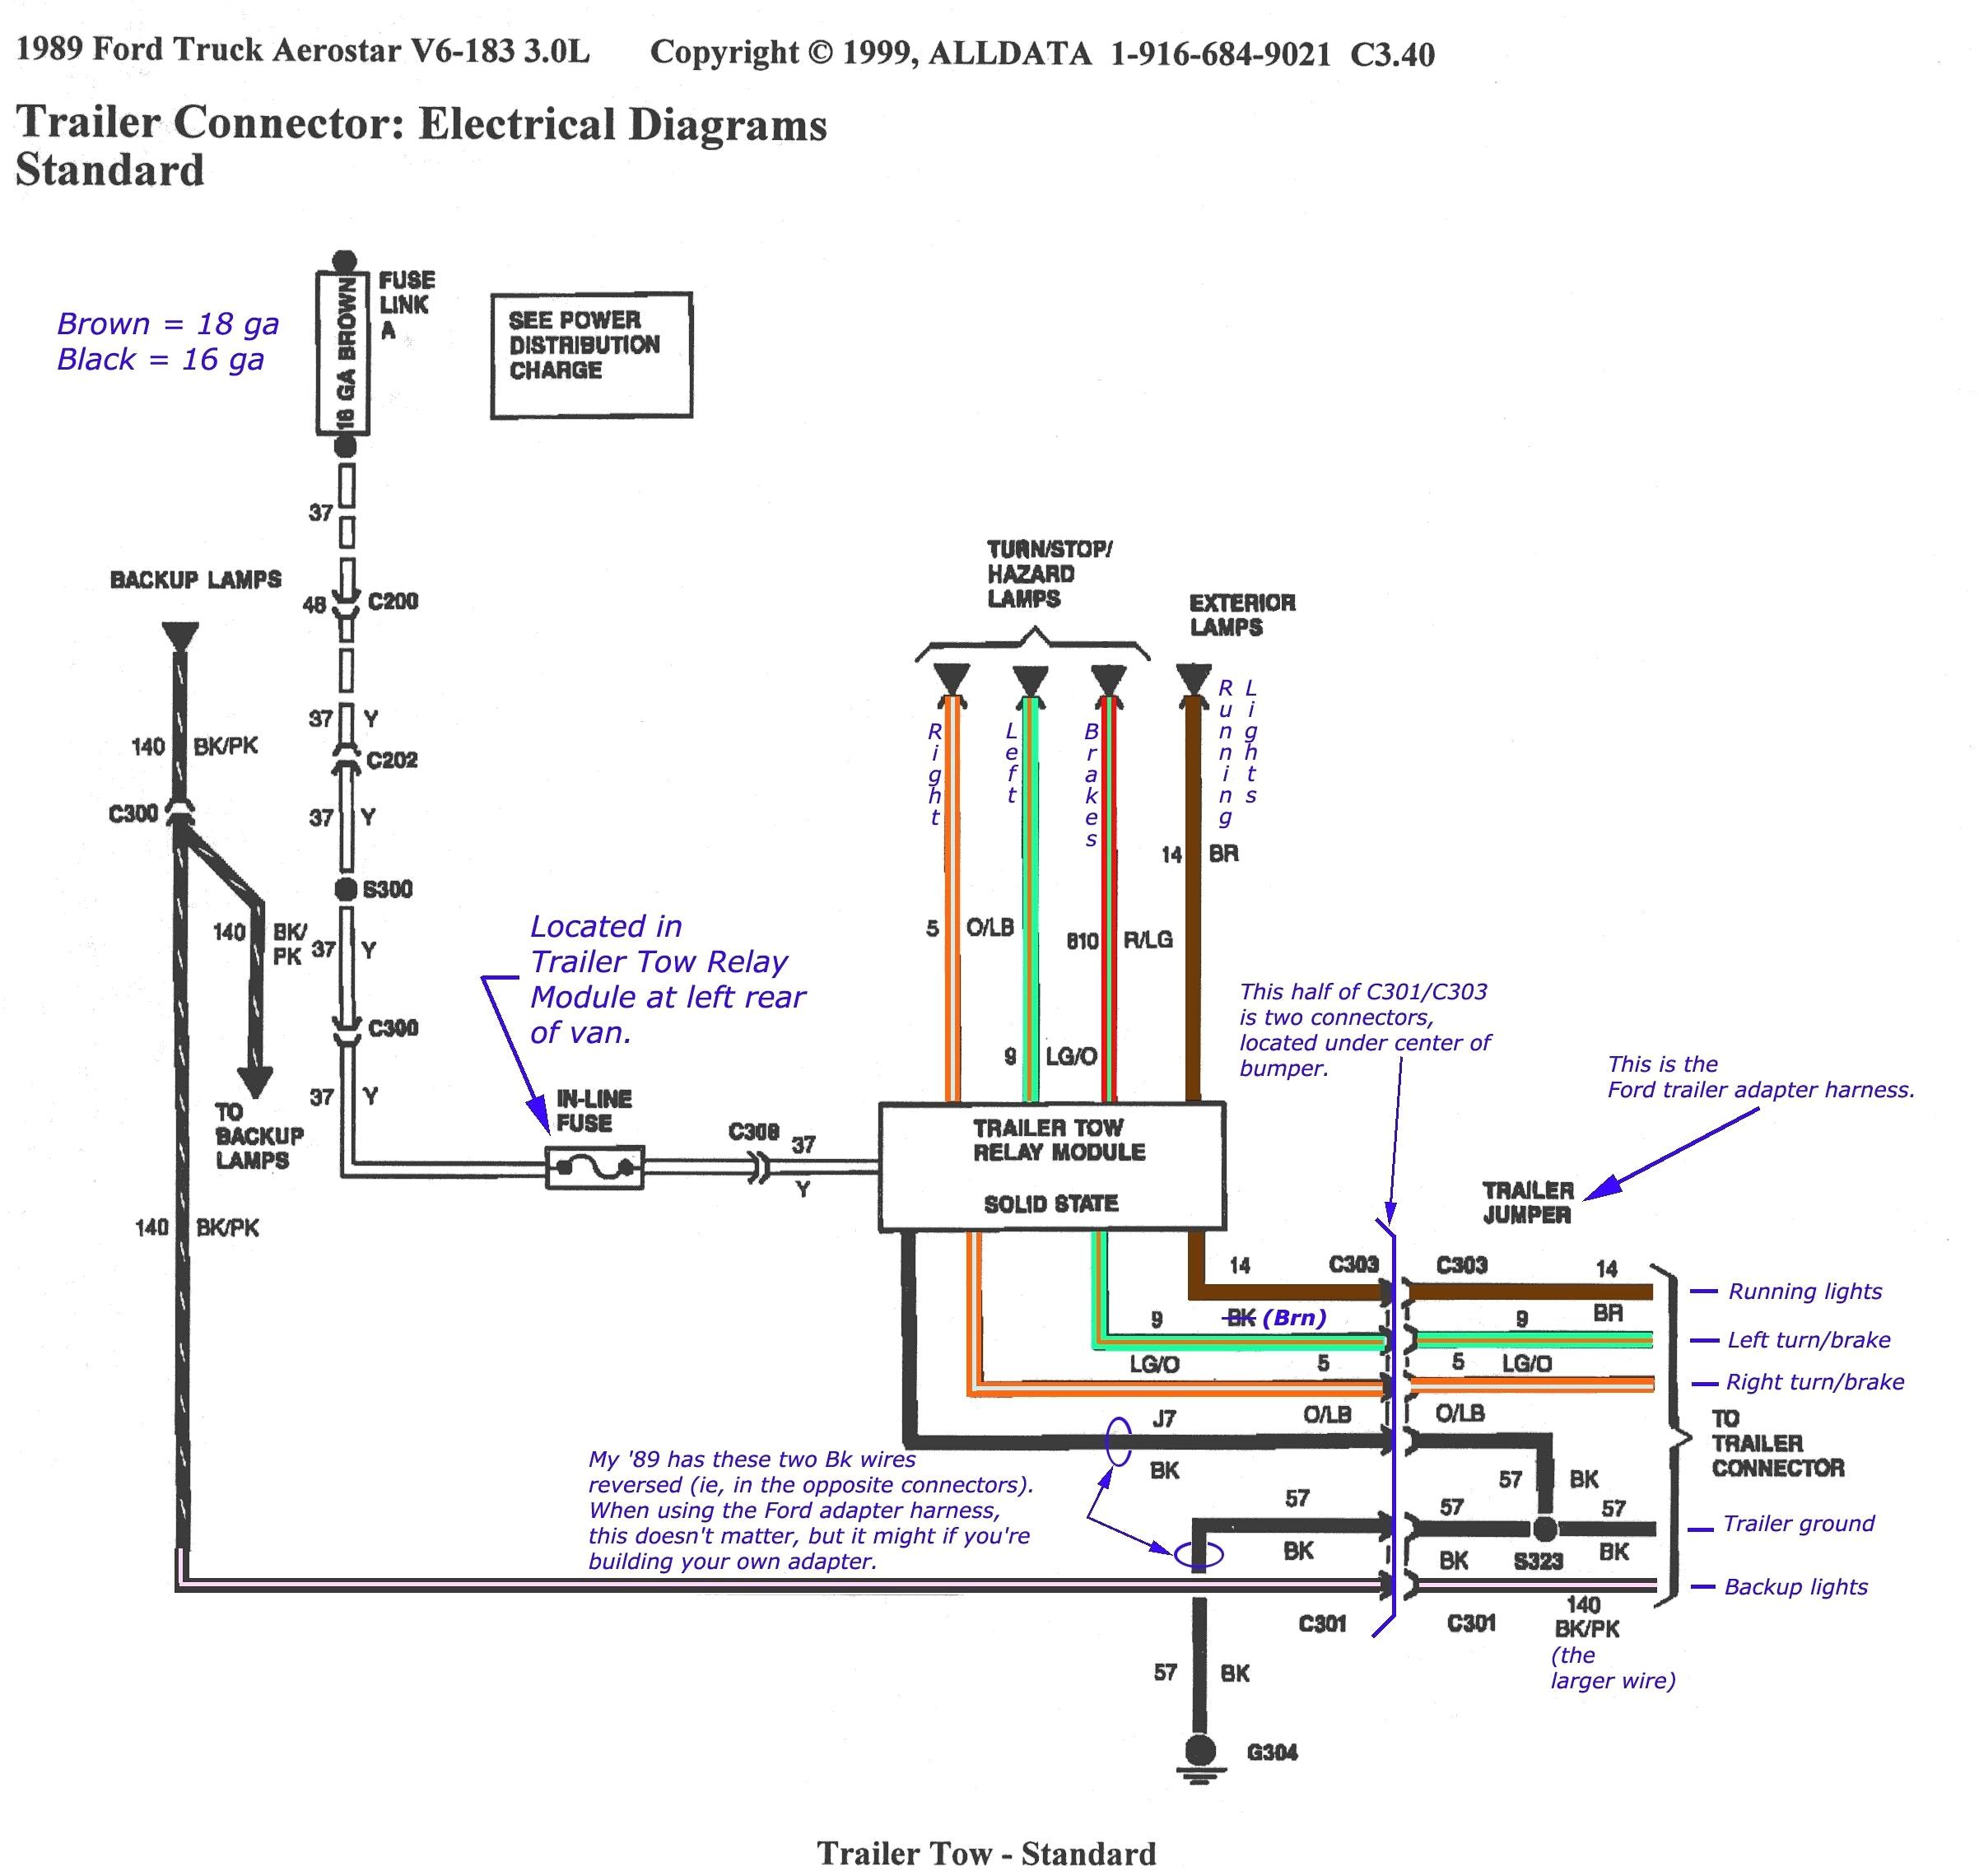 2000 ford trailer wiring diagram wiring diagram pos trailer wiring diagram 2000 ford truck